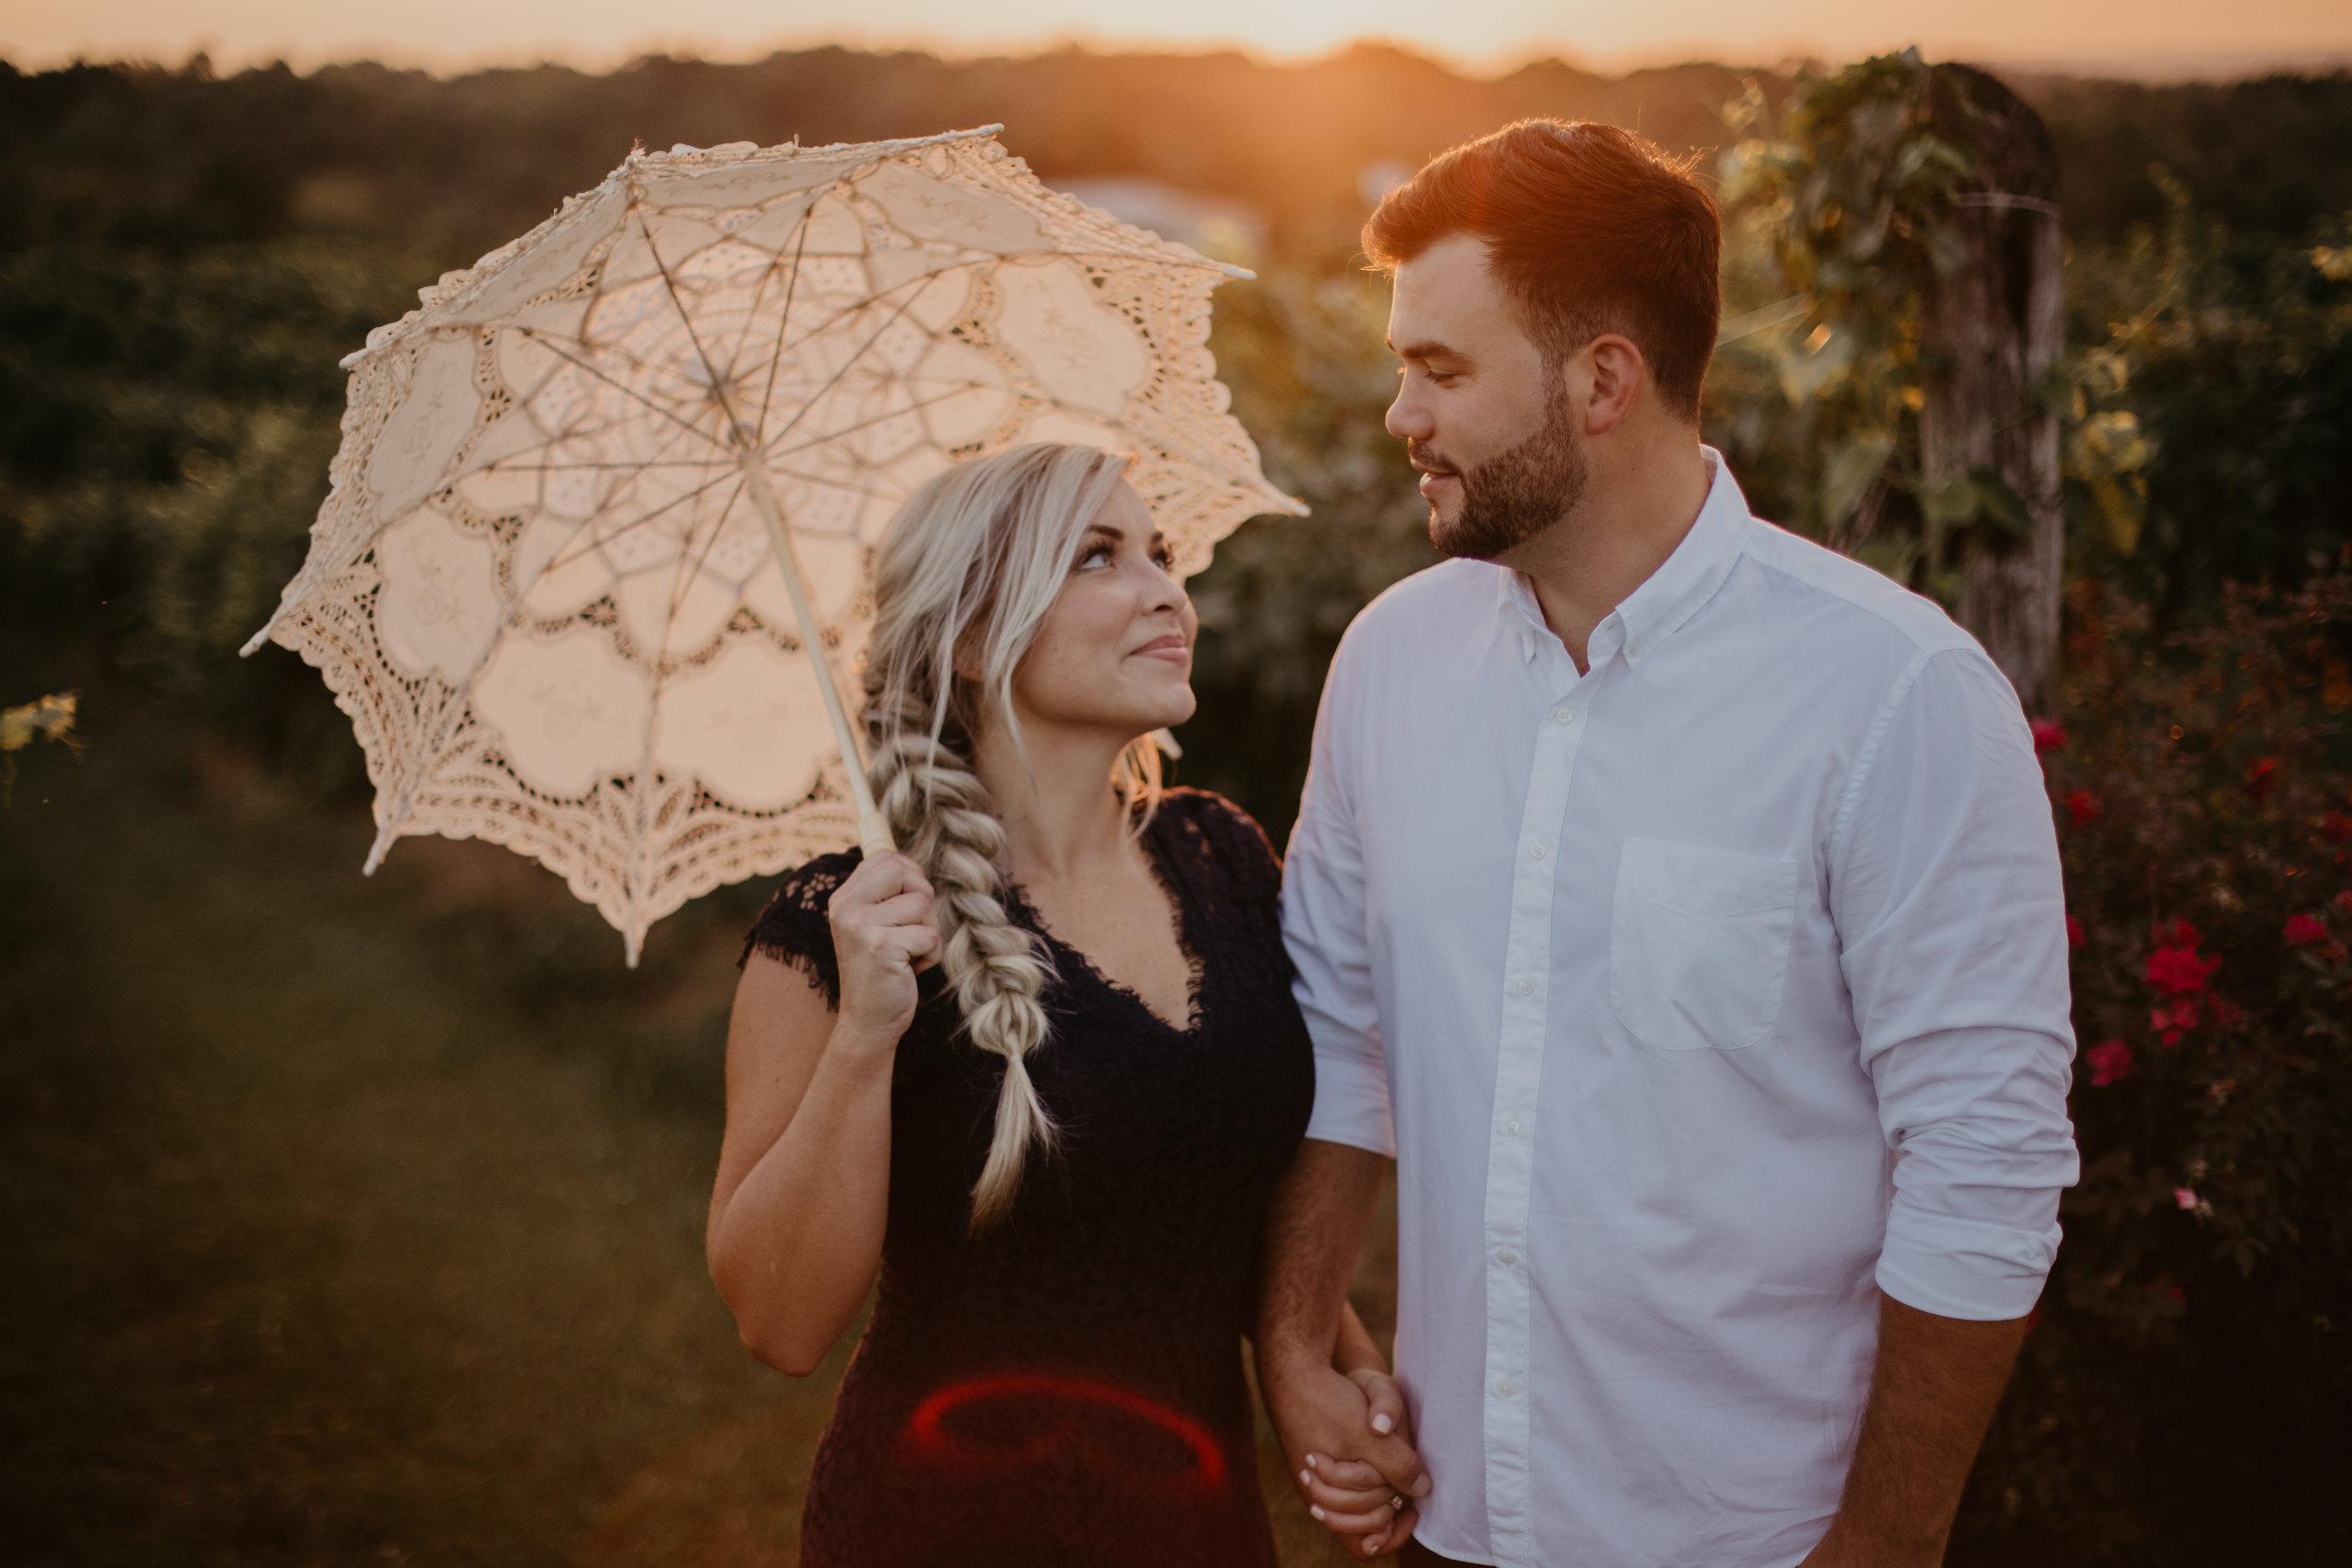 vineoklet-engagement-photos